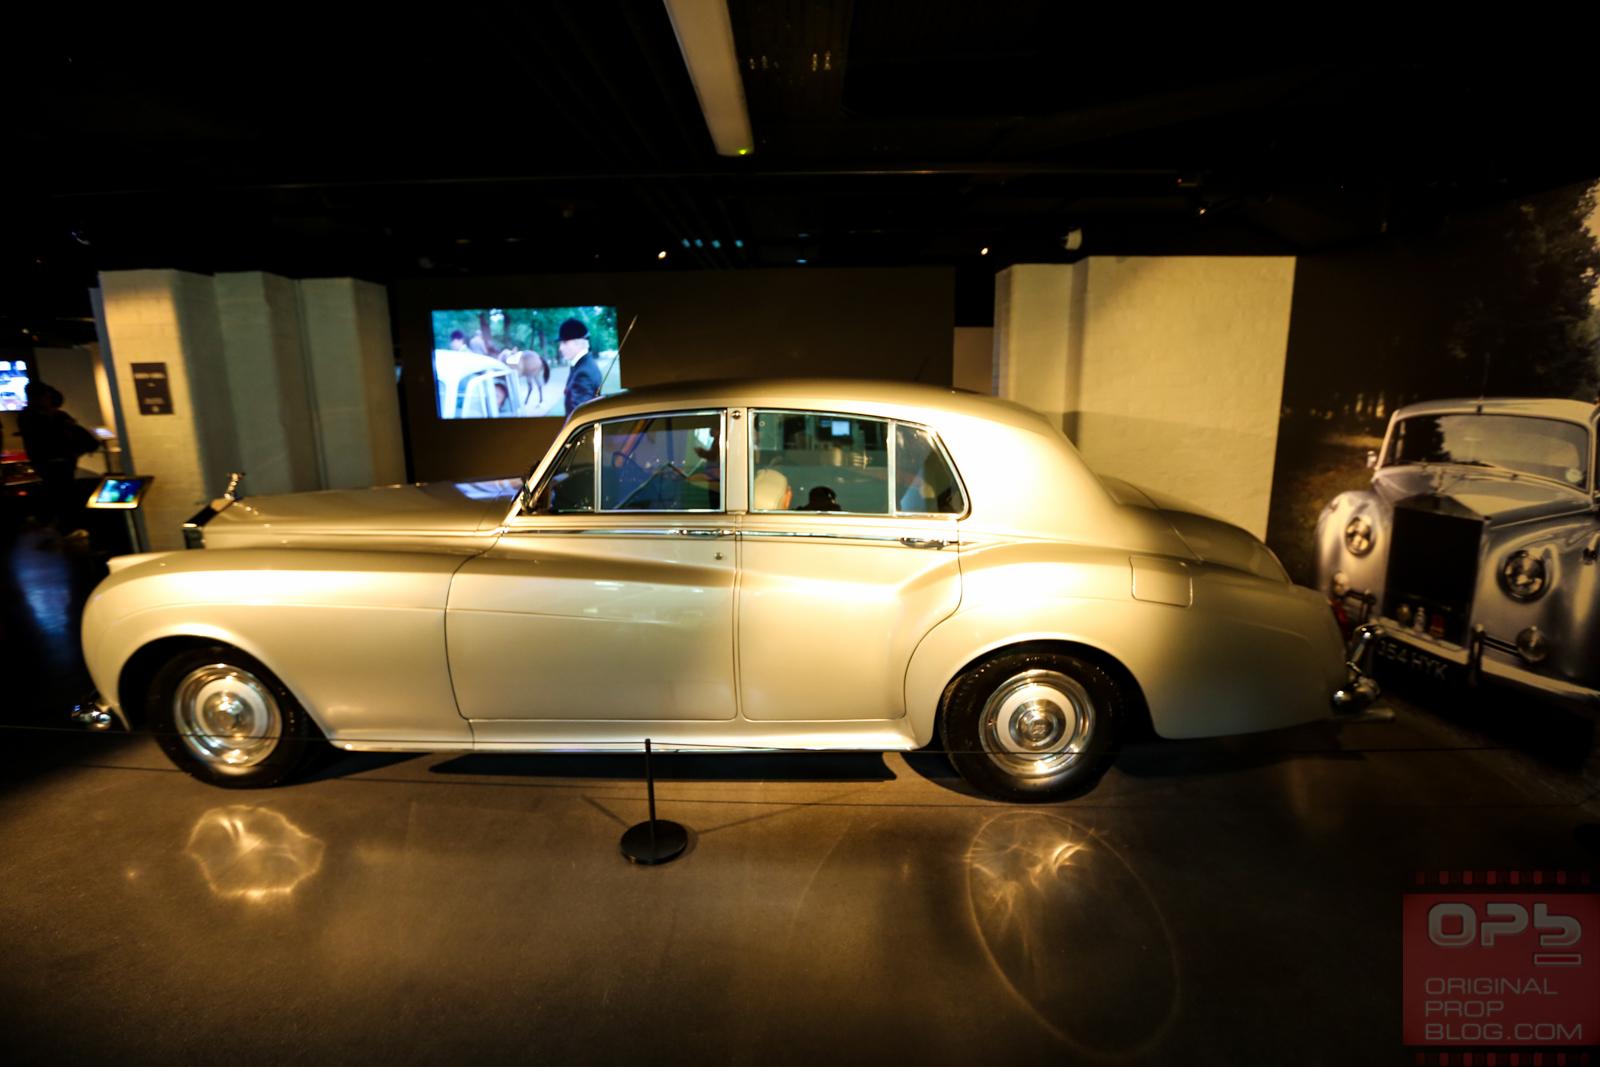 Bond In Motion 007 James Bond Movie Prop Car Exhibition